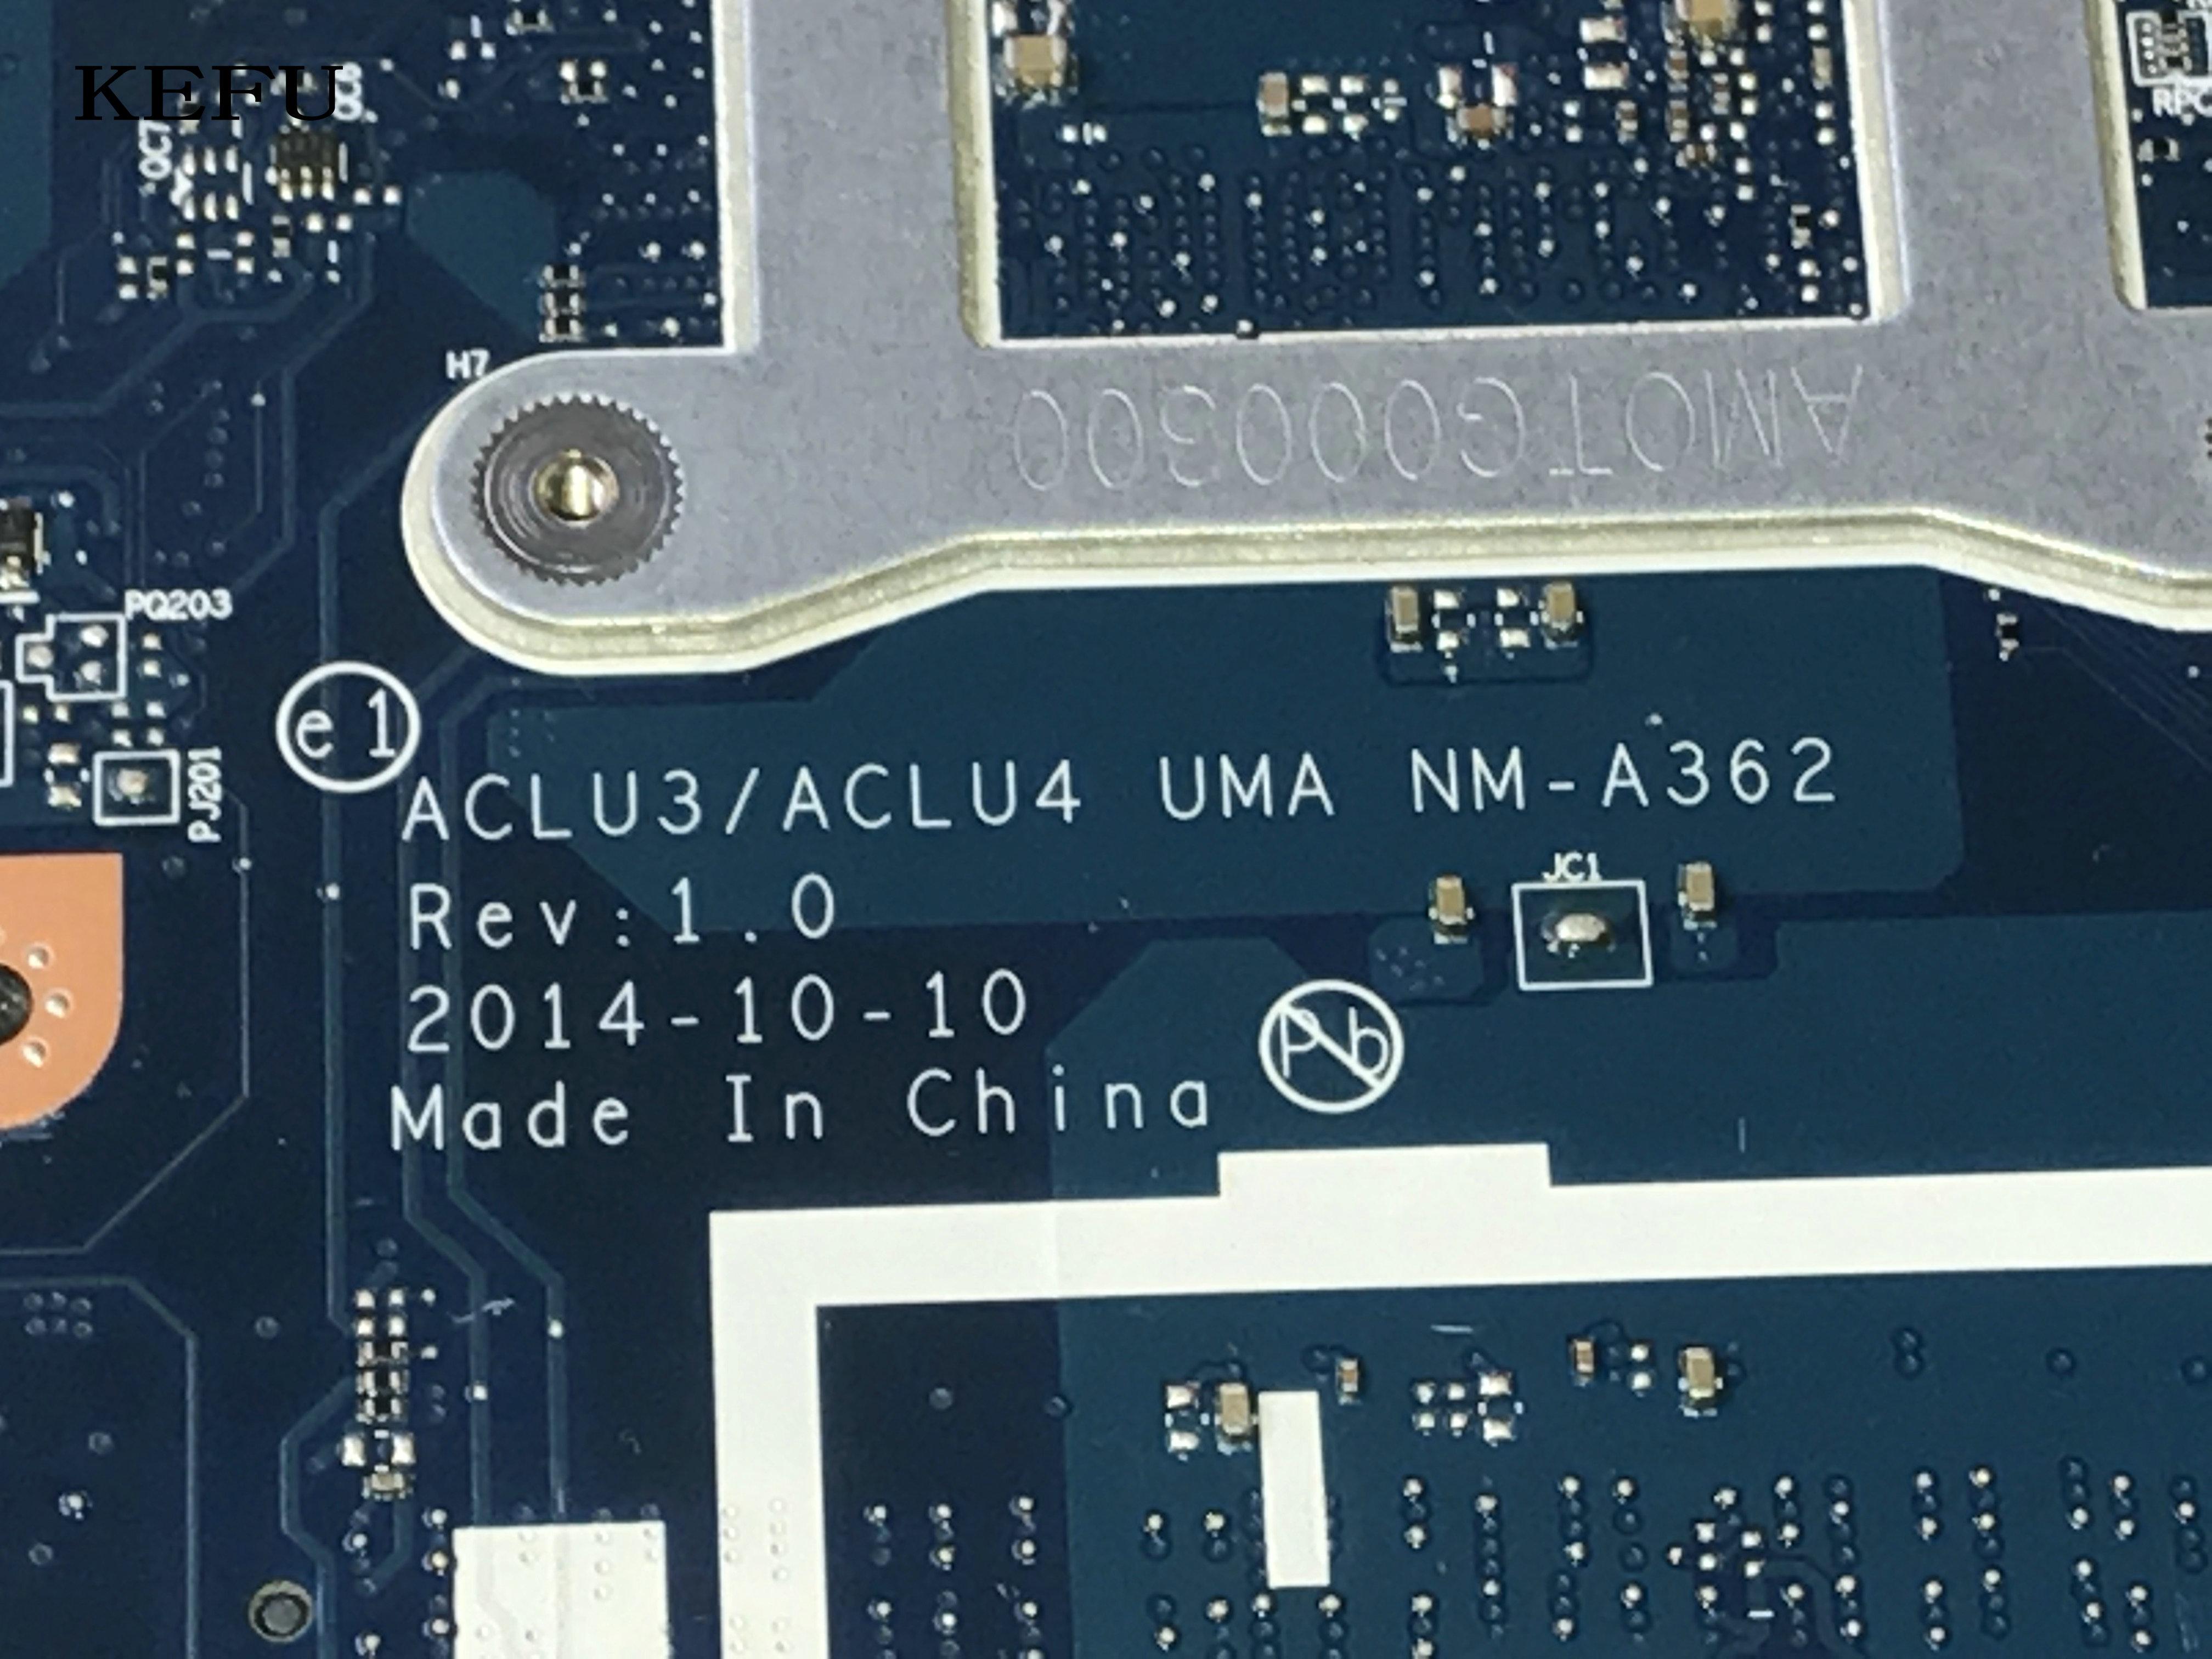 KEFU 100% NEW , ACLU3/ ACLU4 UMA NM-A362 FOR LENOVO G50-80 LAPTOP MOTHERBOARD ,celeron 3558u, Mainboard.(qualified Ok)